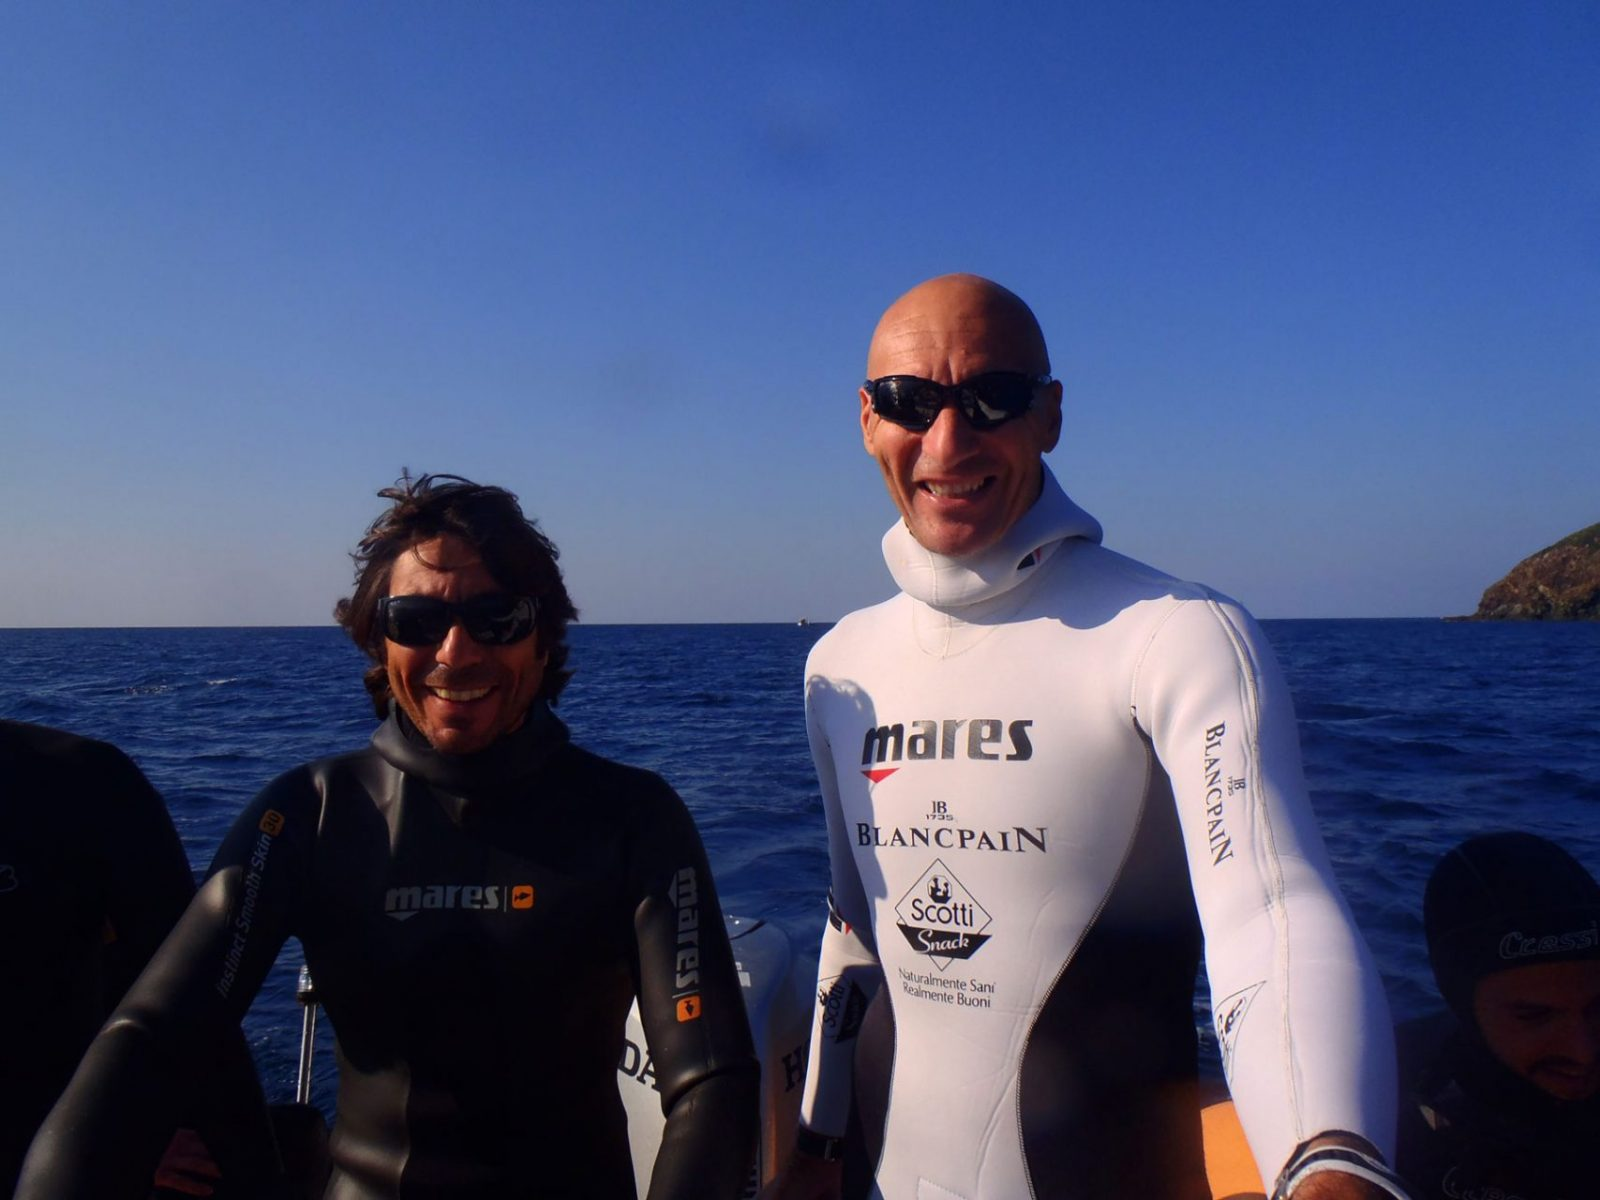 Katabasis Freediving Carlo Boscia